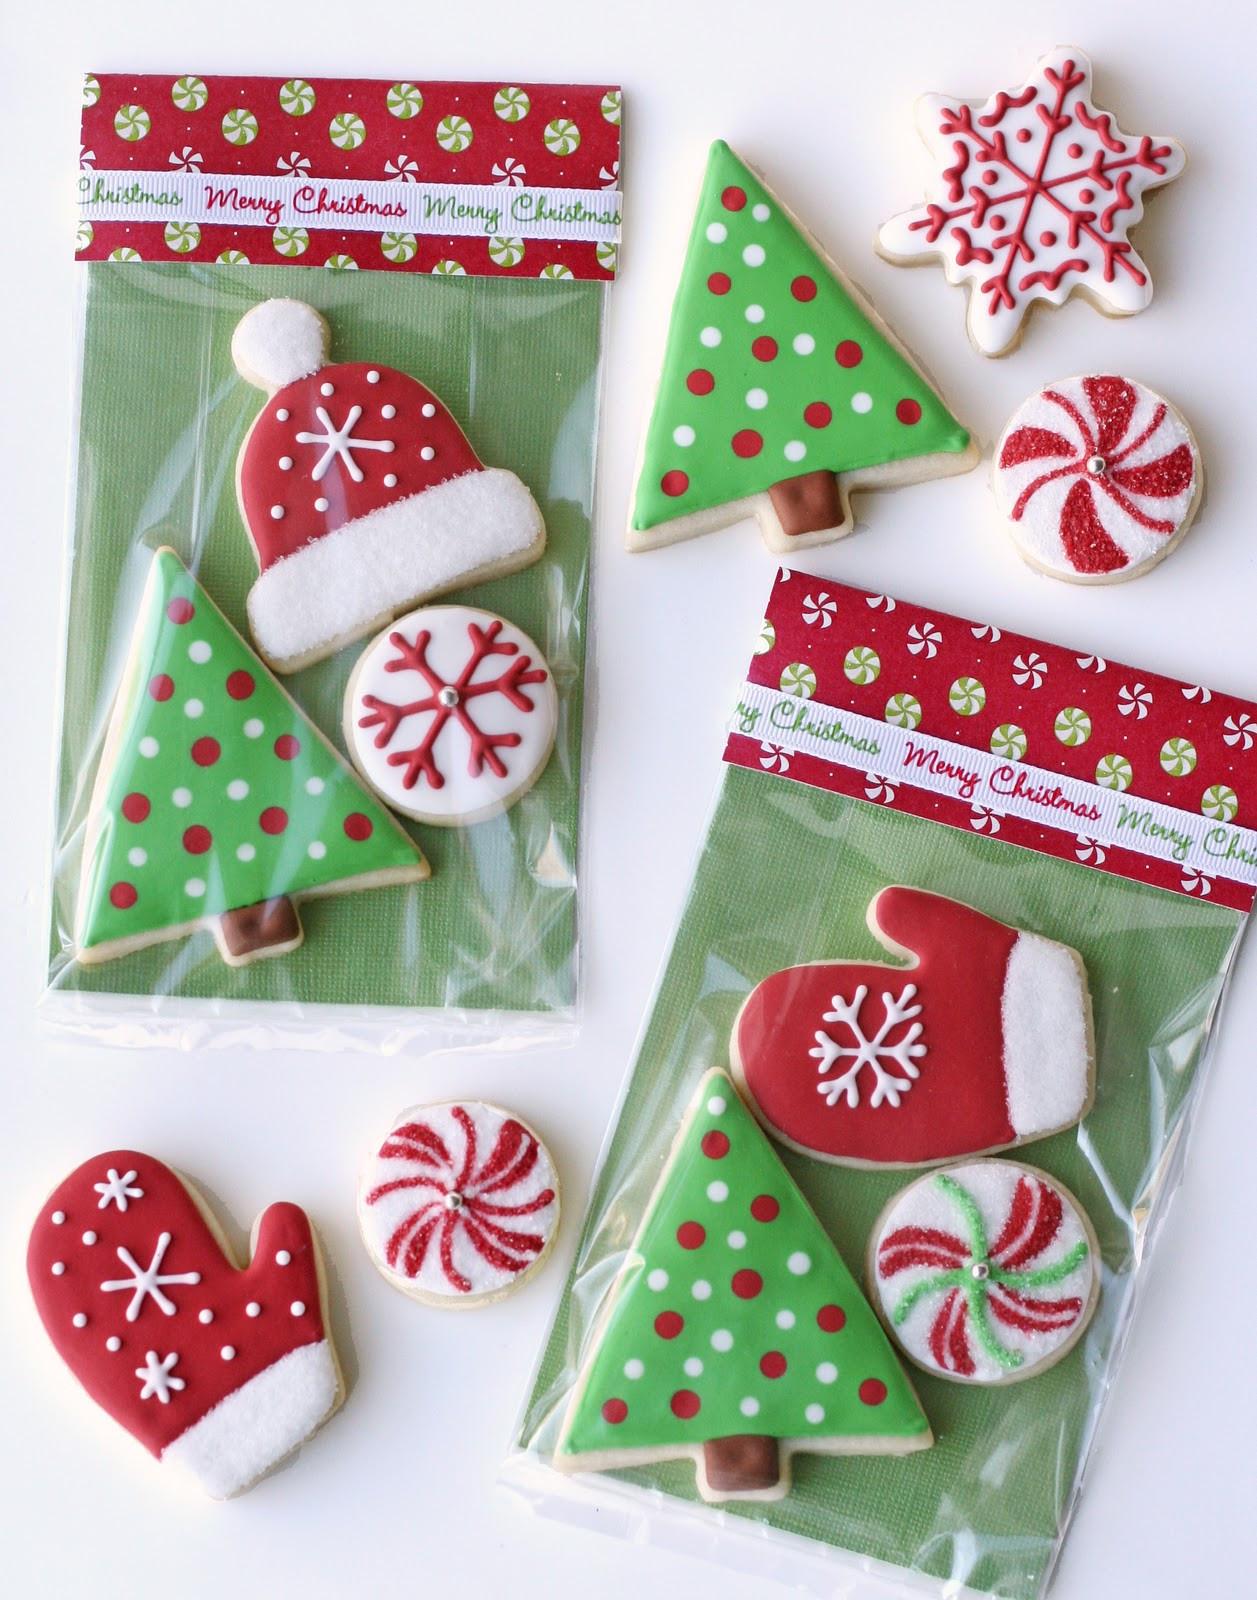 Christmas Present Cookies  Christmas Cookies and Cute Packaging – Glorious Treats